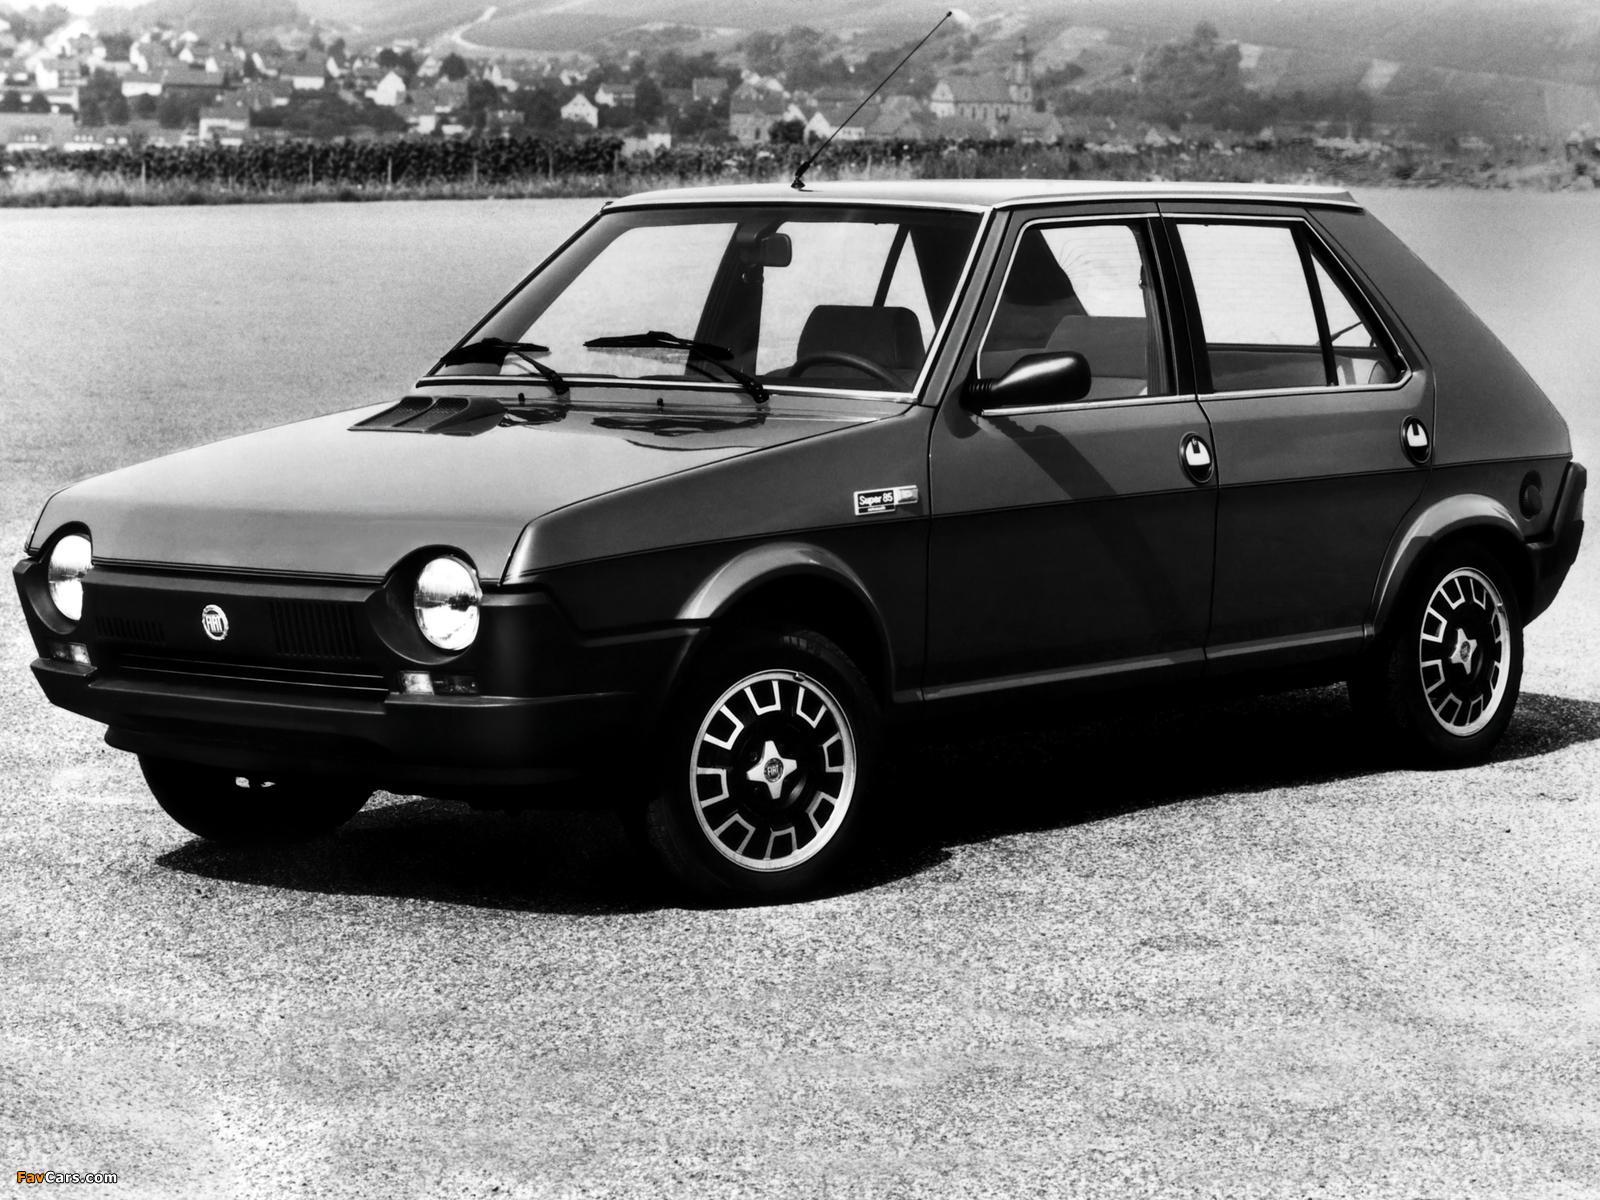 Fiat Ritmo S85 Supermatic 1982 pictures (1600 x 1200)